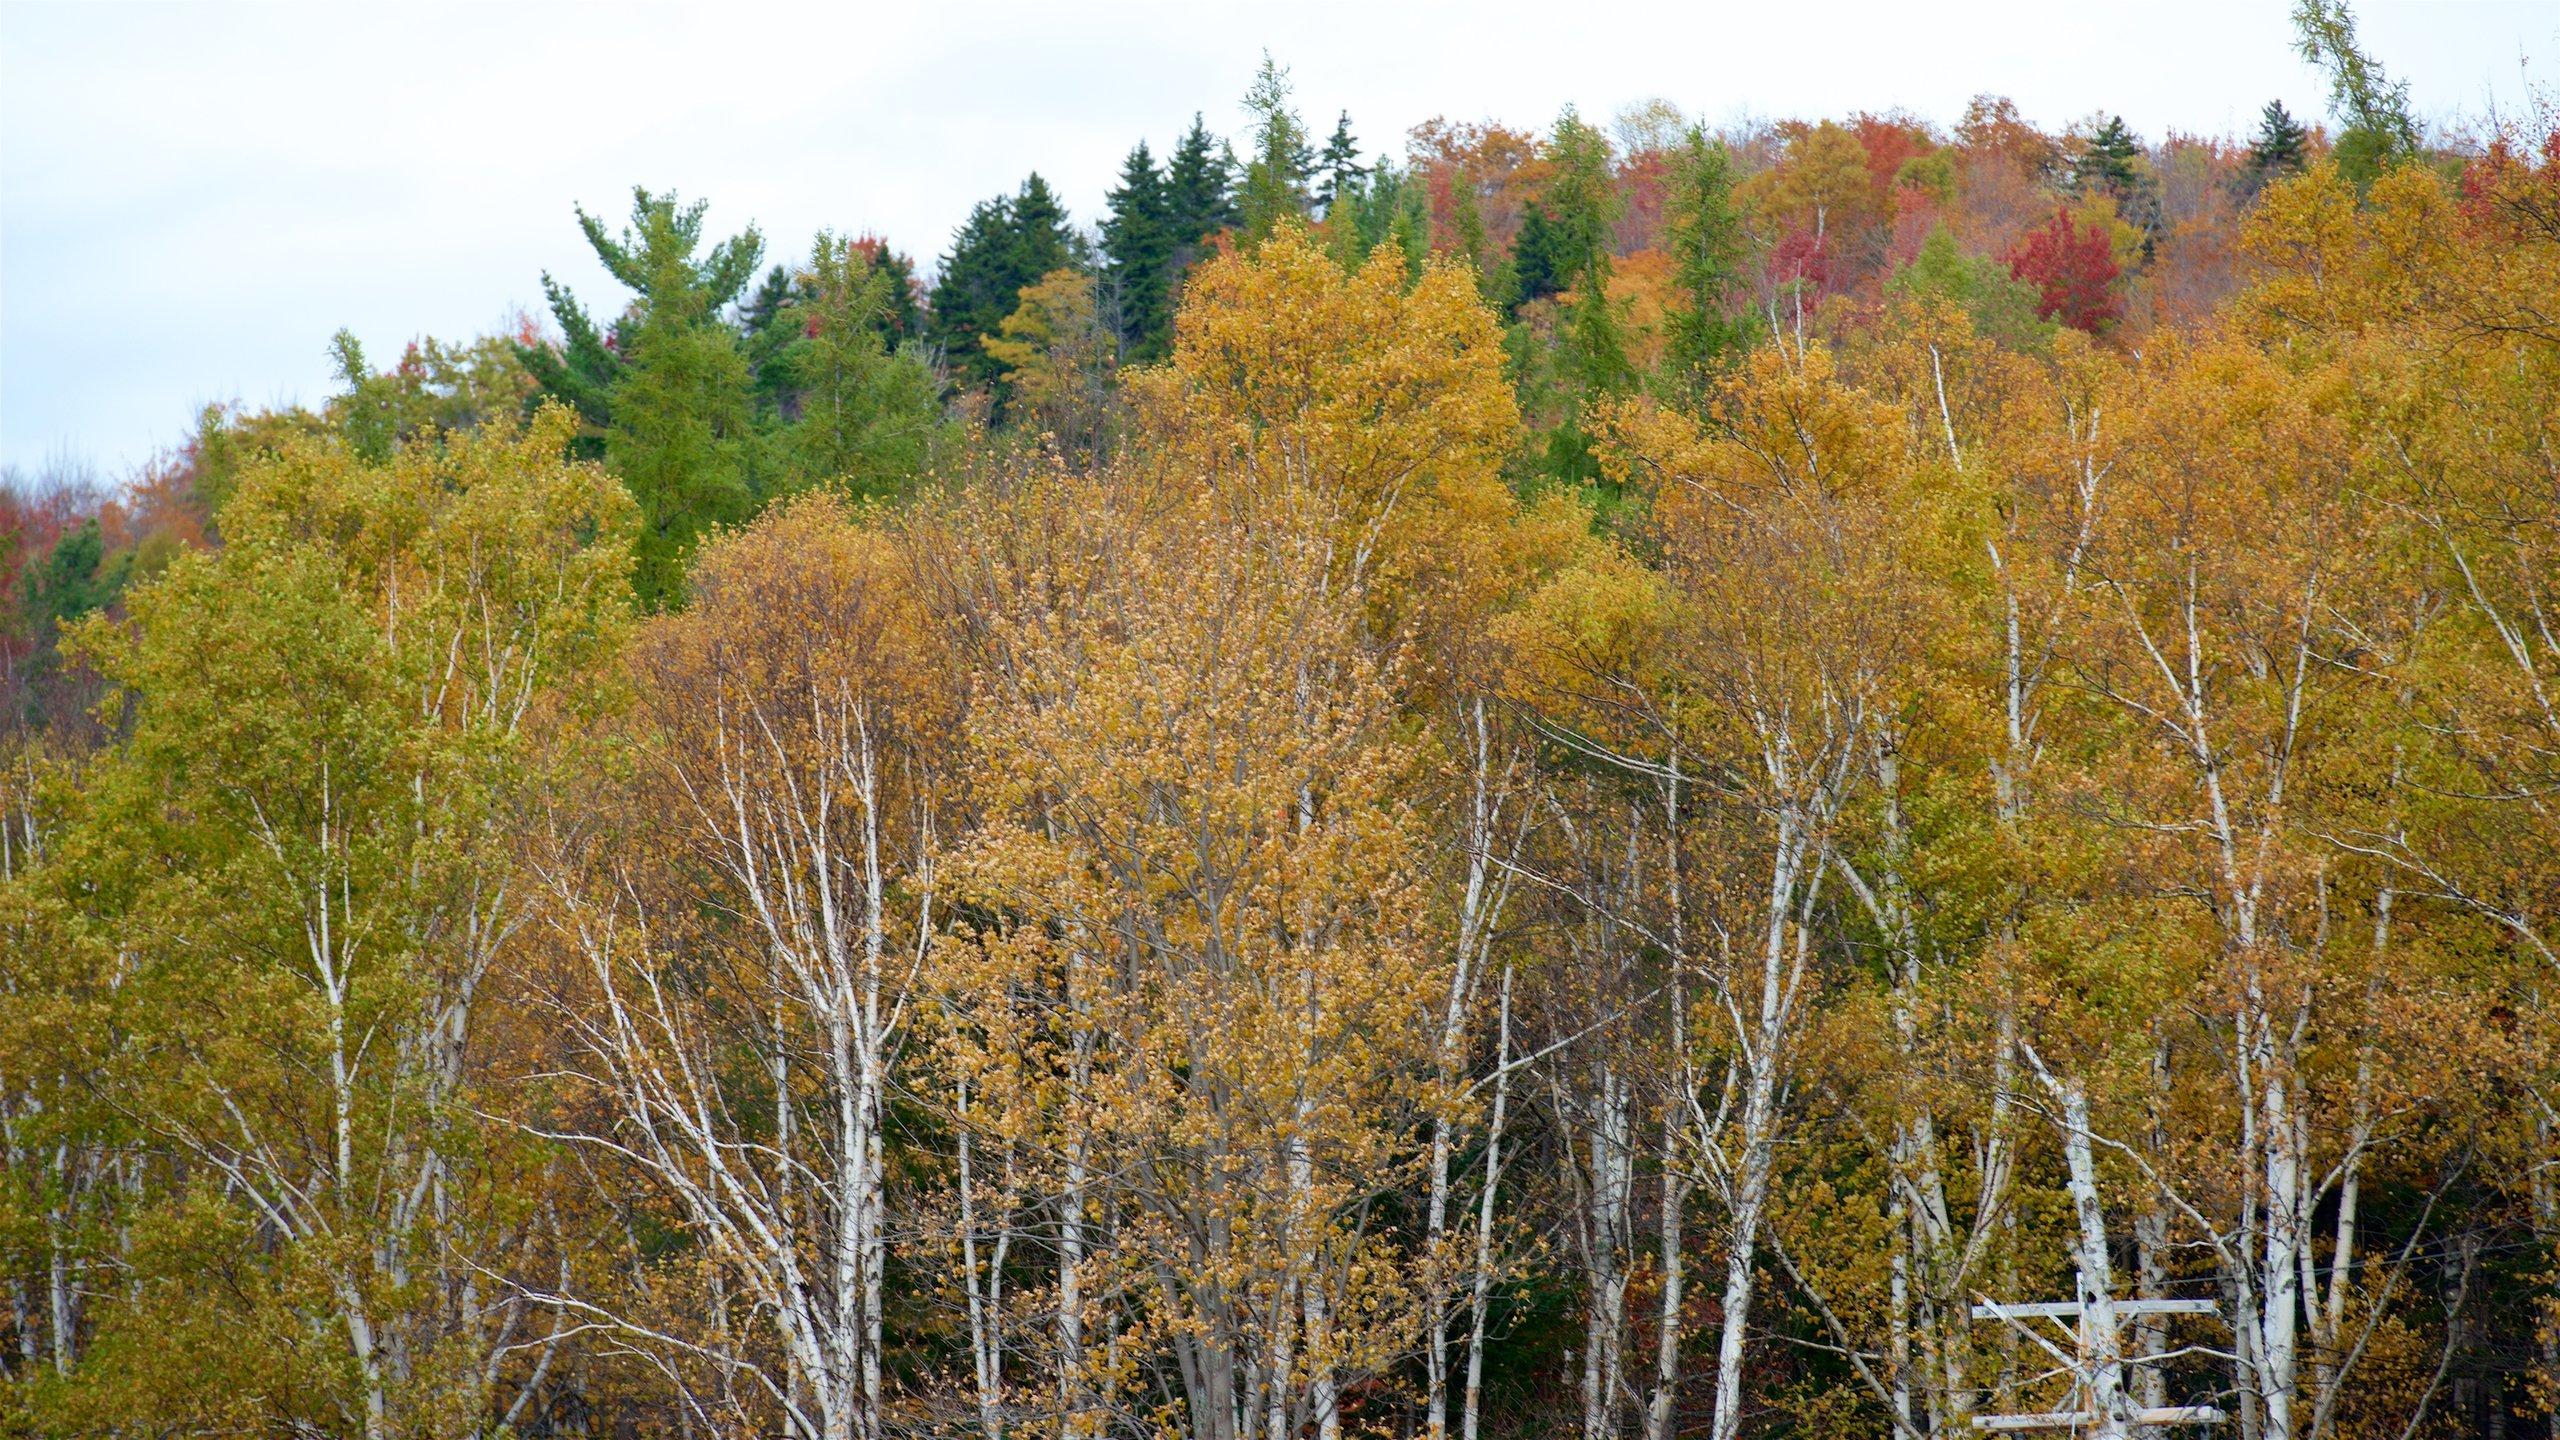 Belknap County, New Hampshire, United States of America